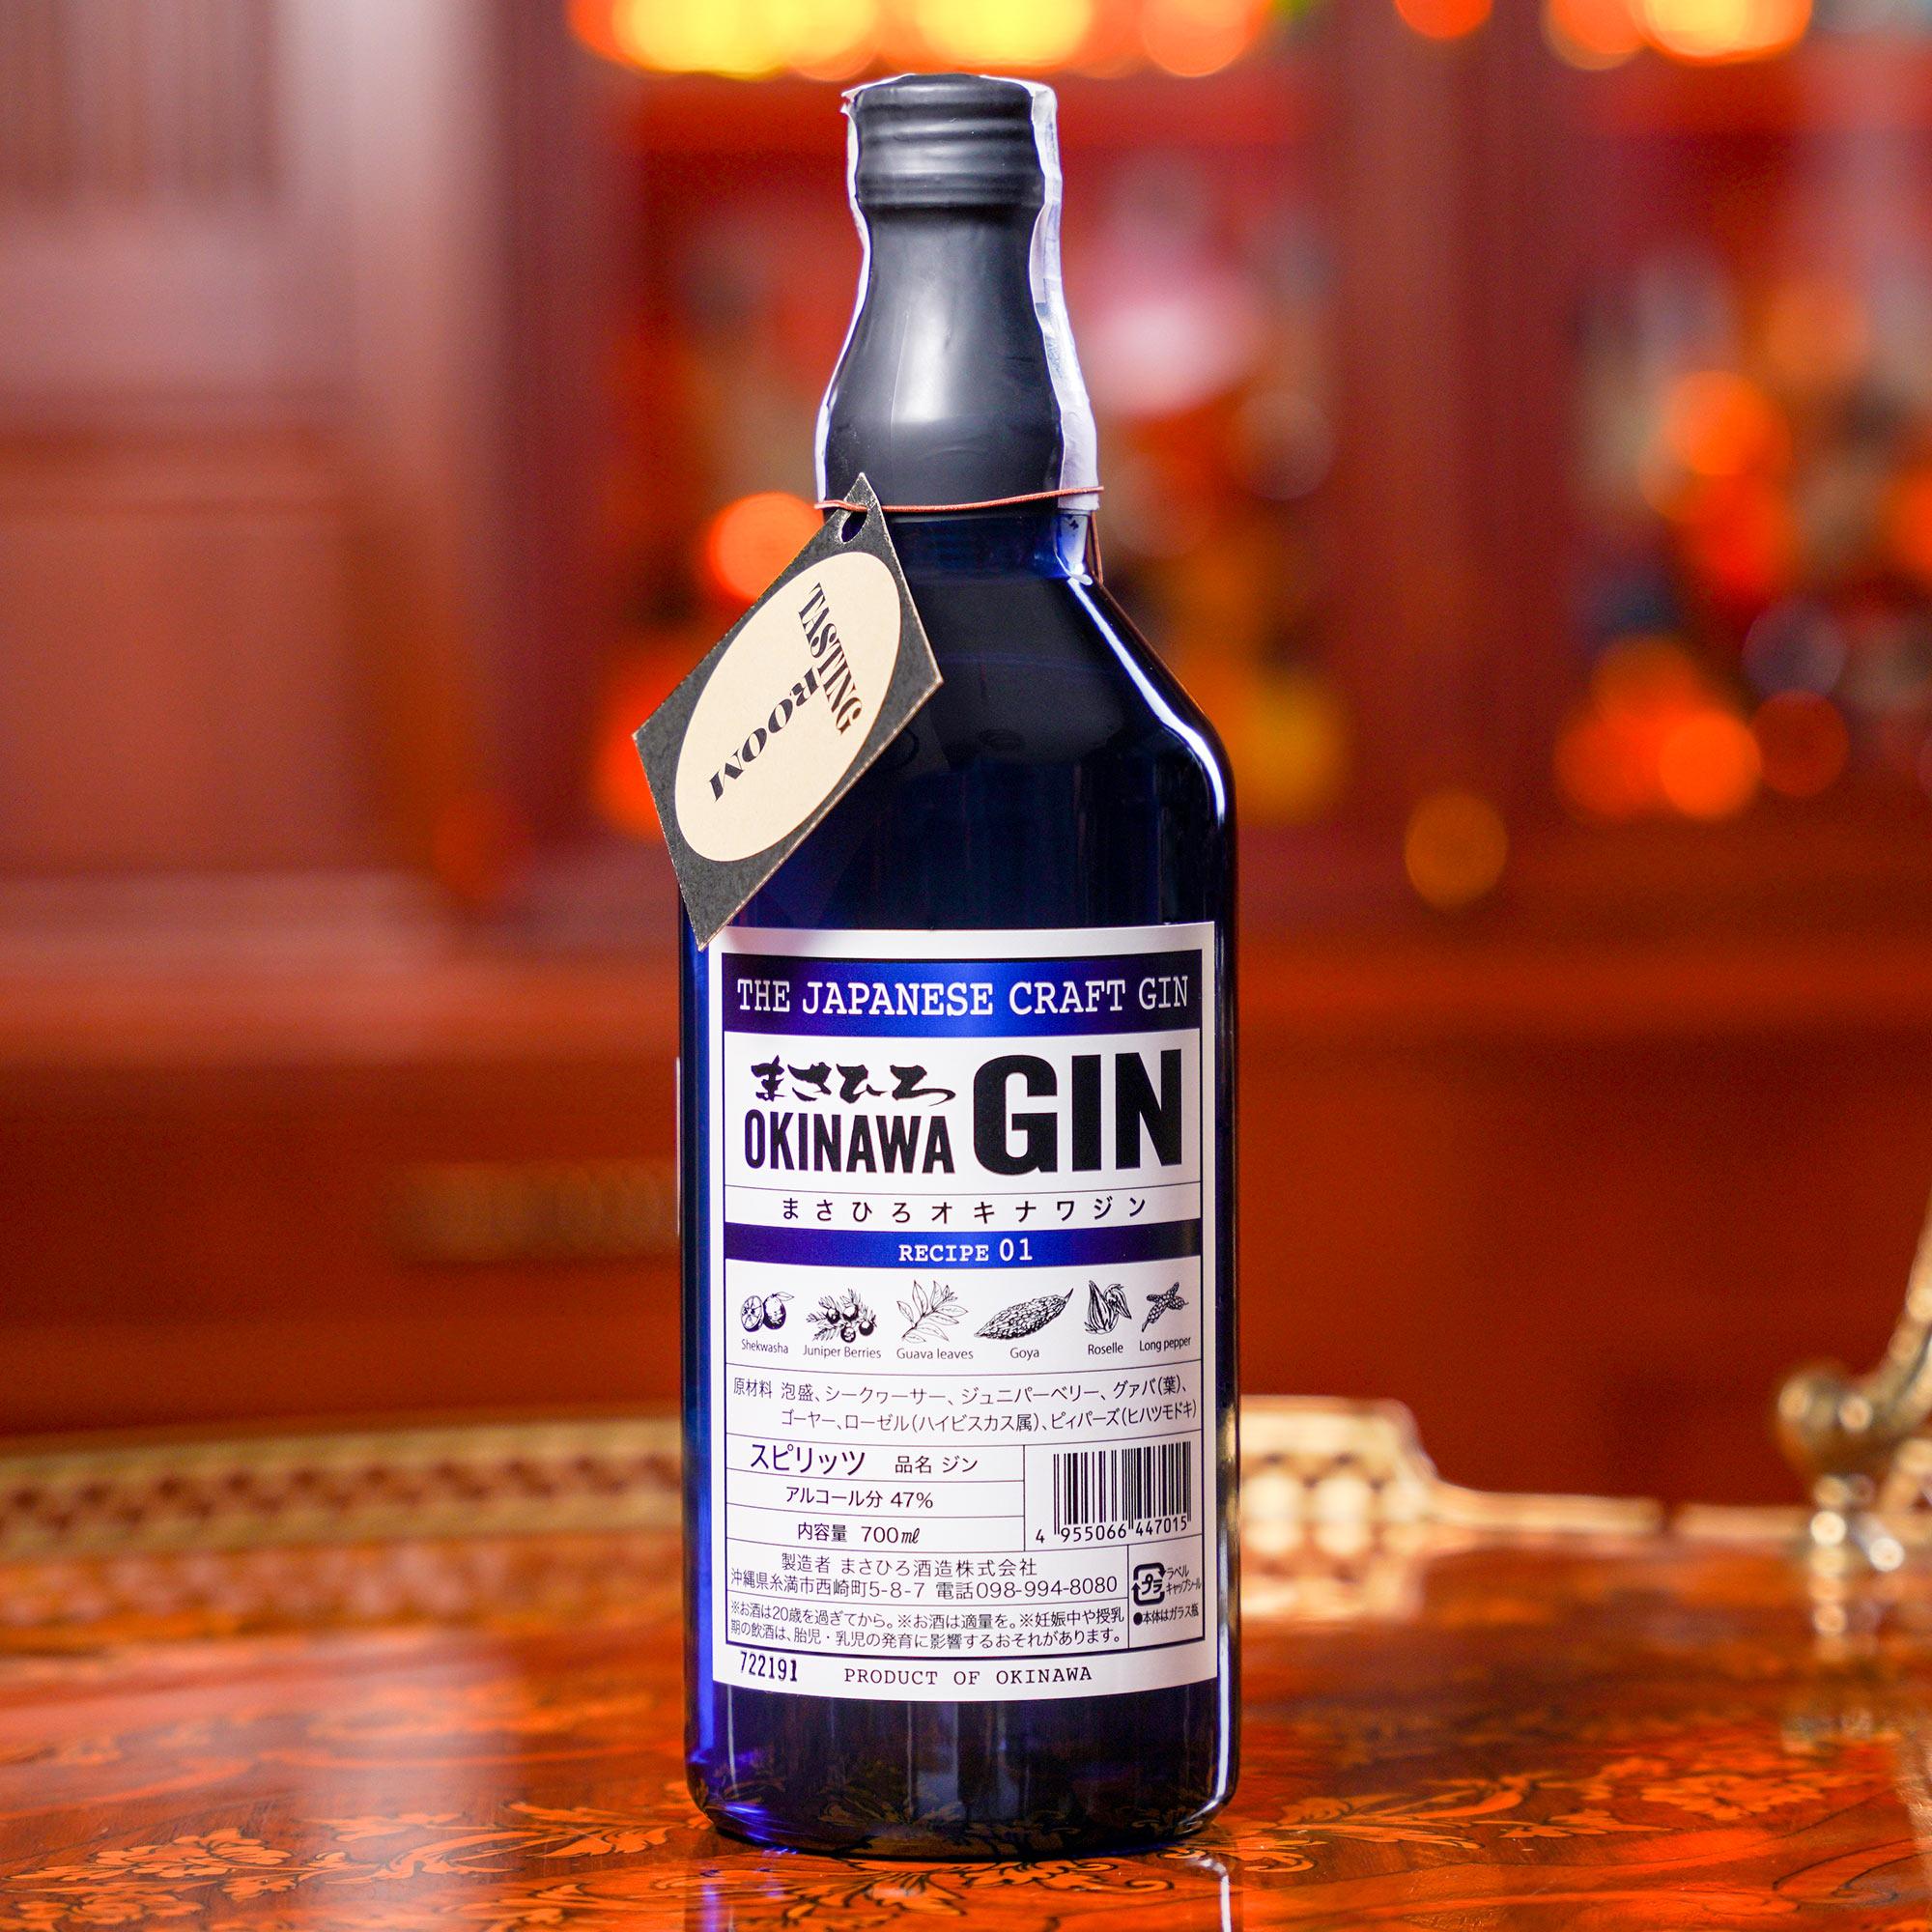 Masahiro Okinawa Craft Gin /Масахиро Окинава Крафт Джин